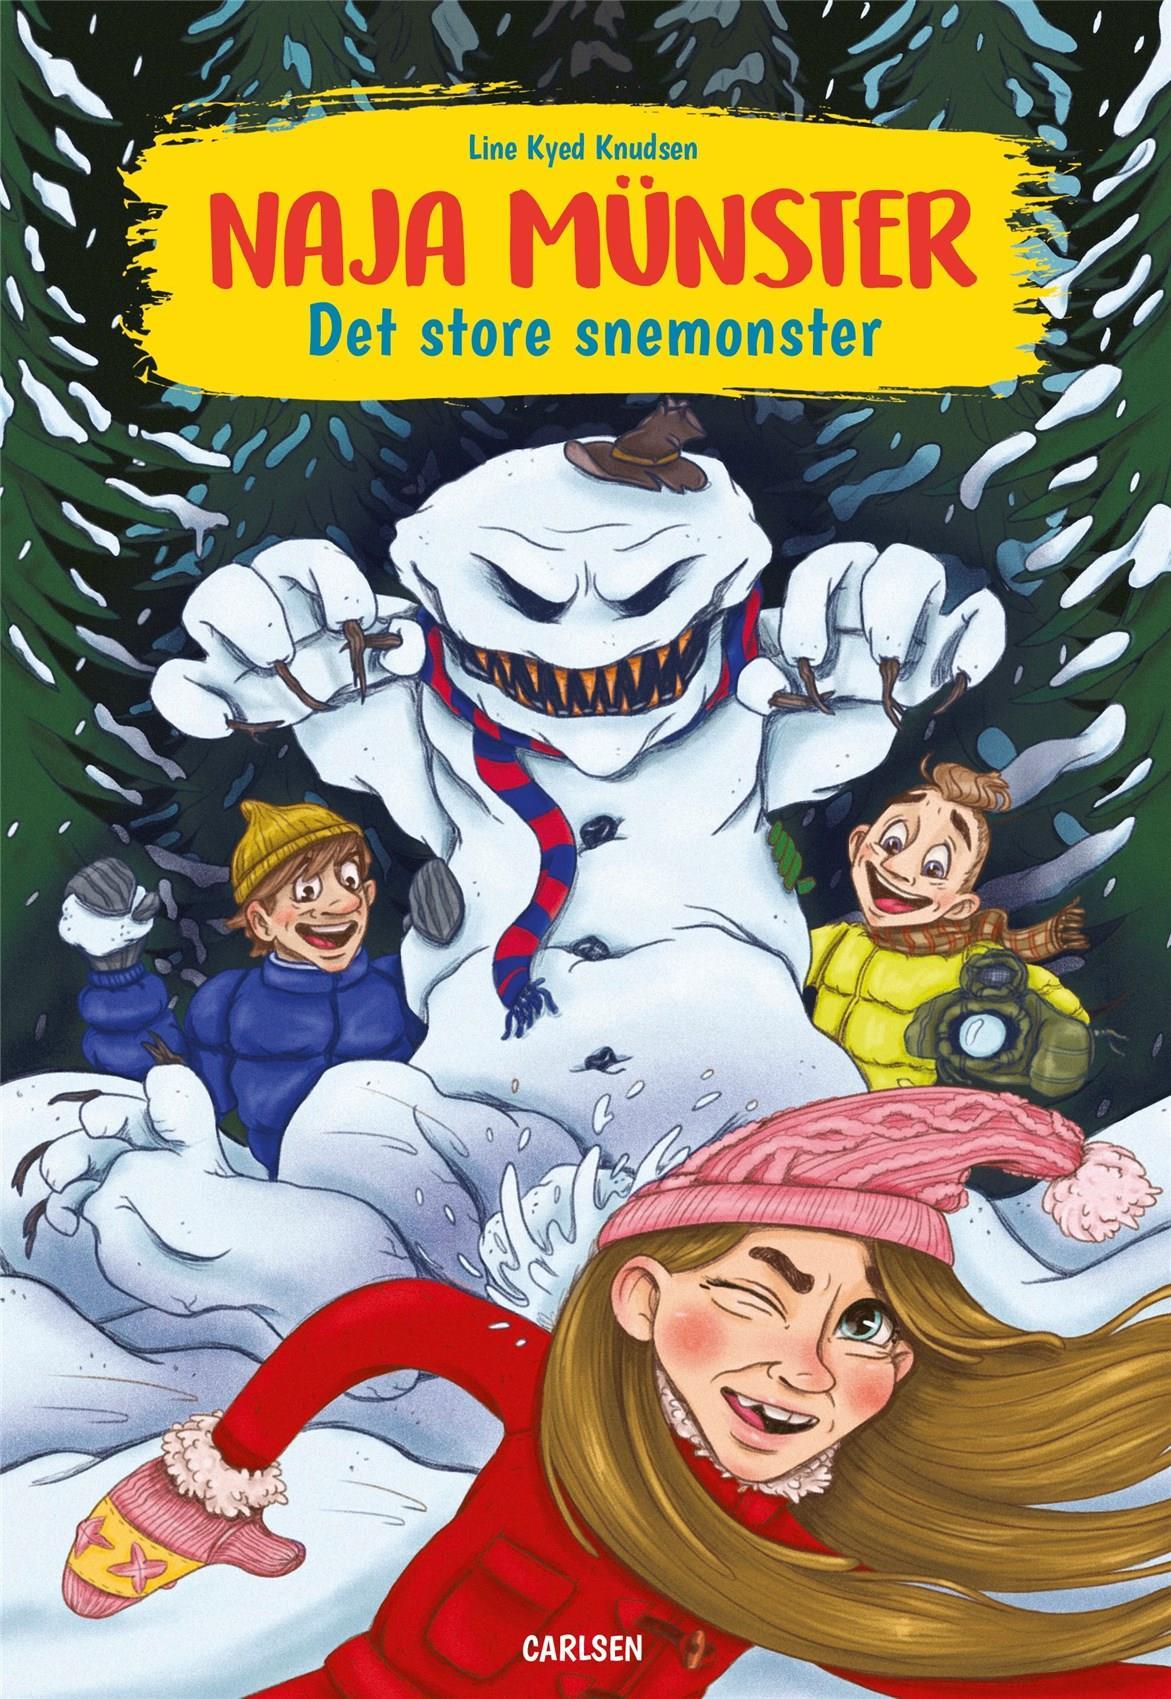 Naja Münster: Naja Münster - Det store snemonster - Line Kyed Knudsen - Bøger - CARLSEN - 9788711983485 - 5/5-2020